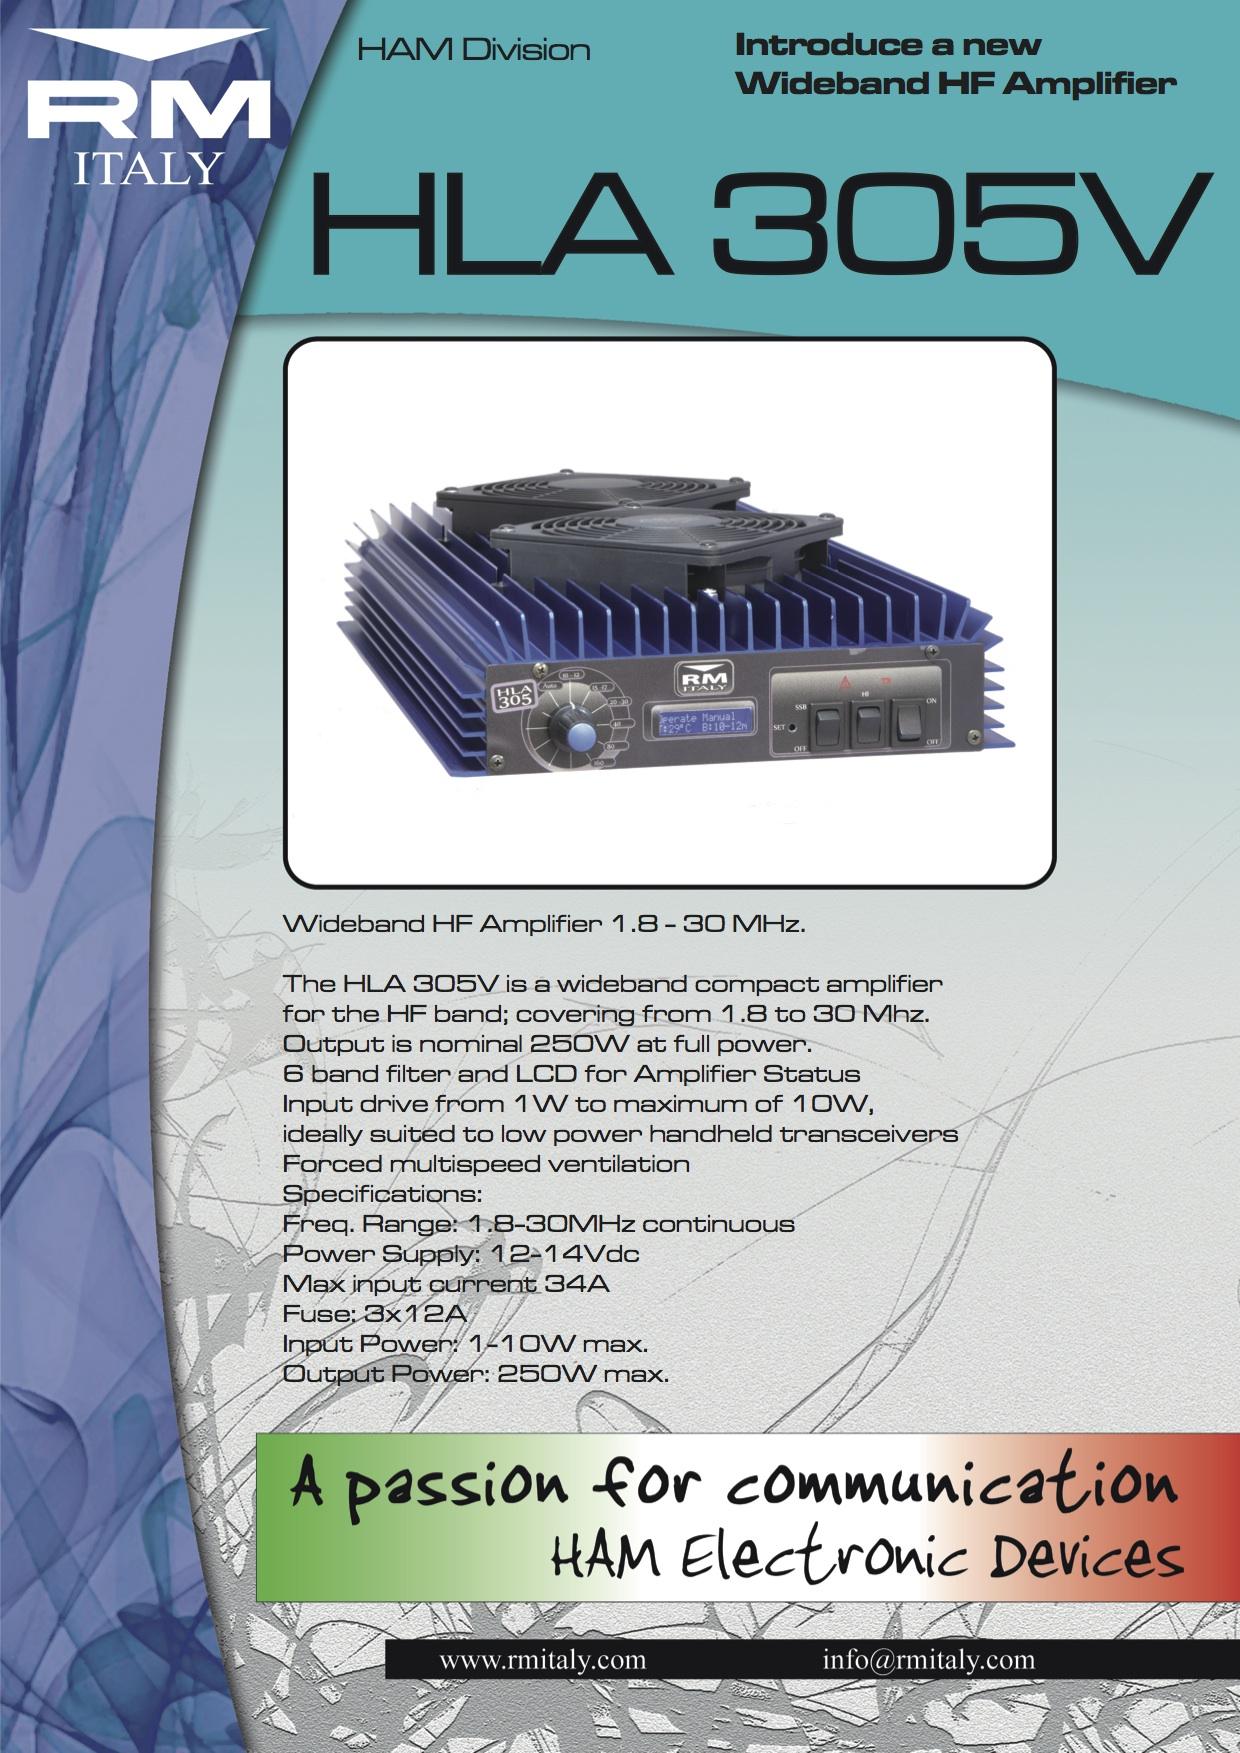 Dnj Radio Blog Rm Italy Hla 300 Plus Linear Amplifier Vs The New Hf 300khz 30mhz 305v